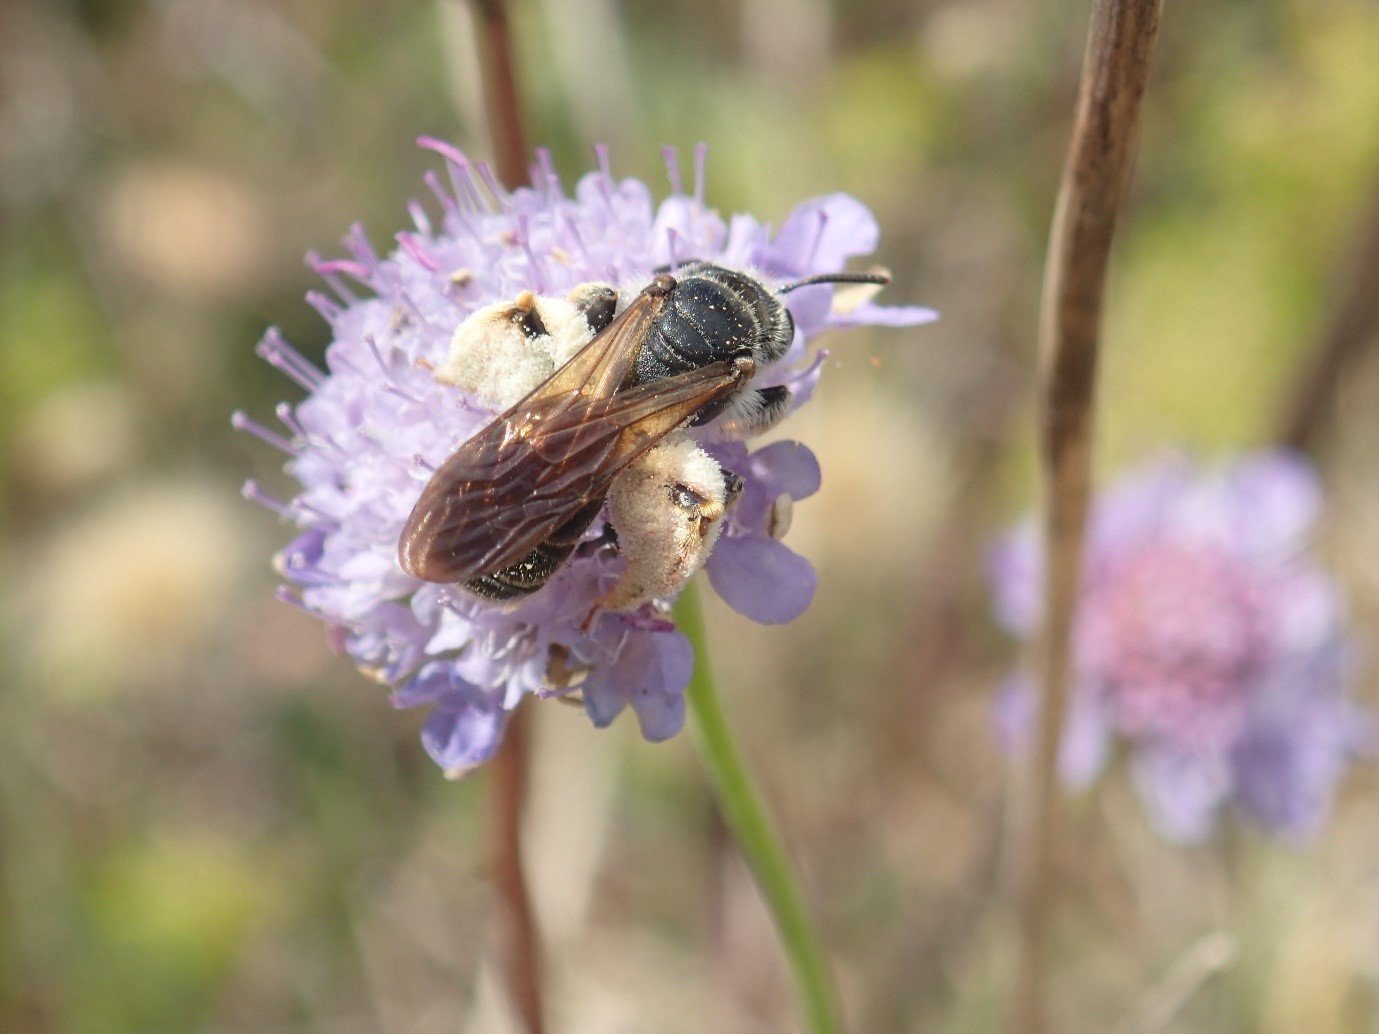 Honey bee on a light purple wild flower in close up